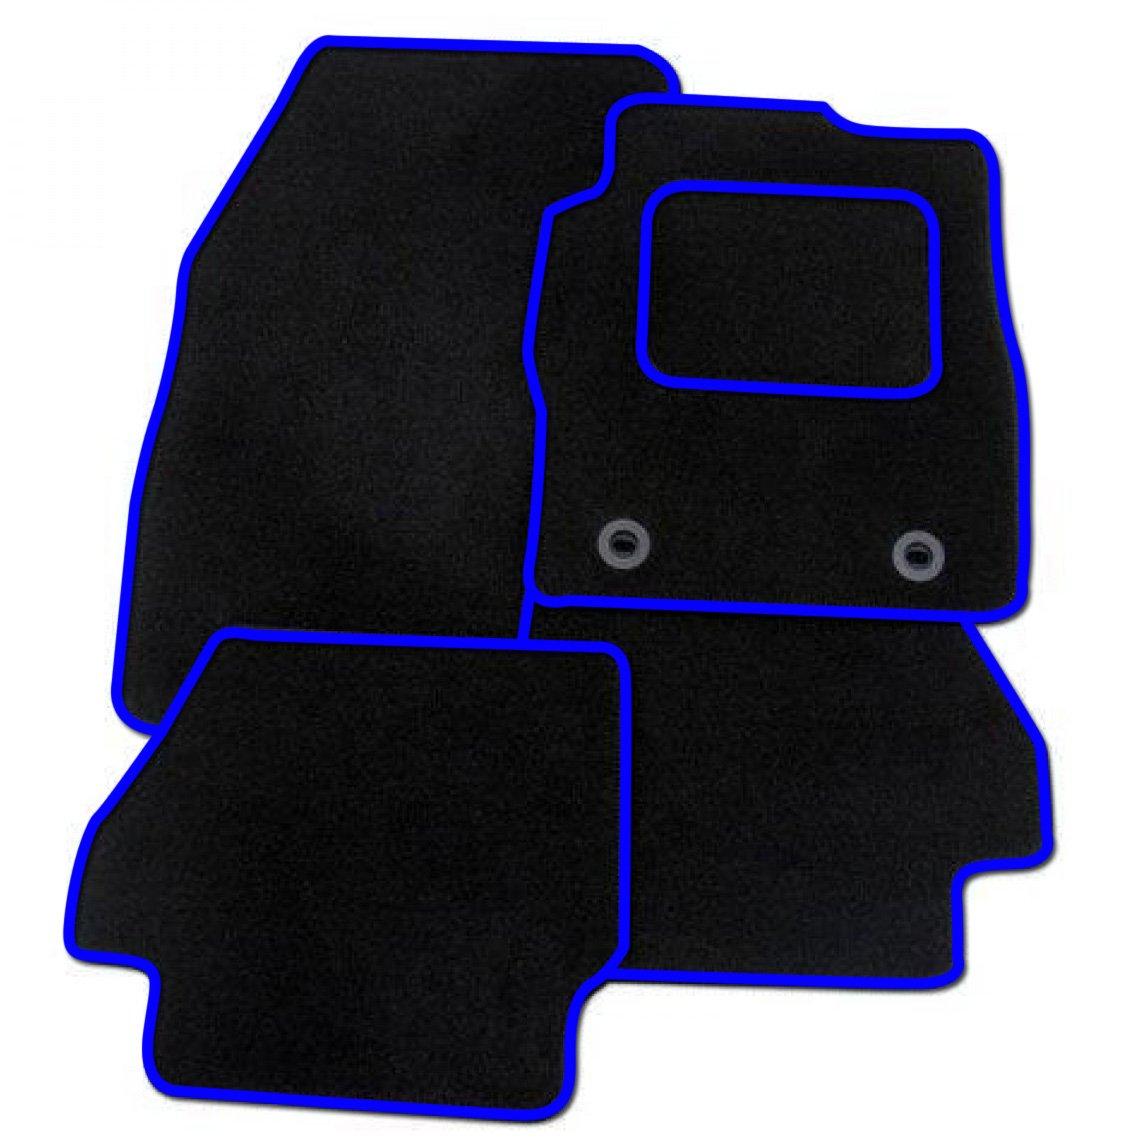 FORD FOCUS ST (2005-2011) BLACK + BLUE TRIM TAILORED CAR FLOOR MATS CARPET Amazon.co.uk Car u0026 Motorbike  sc 1 st  Amazon UK & FORD FOCUS ST (2005-2011) BLACK + BLUE TRIM TAILORED CAR FLOOR ... markmcfarlin.com